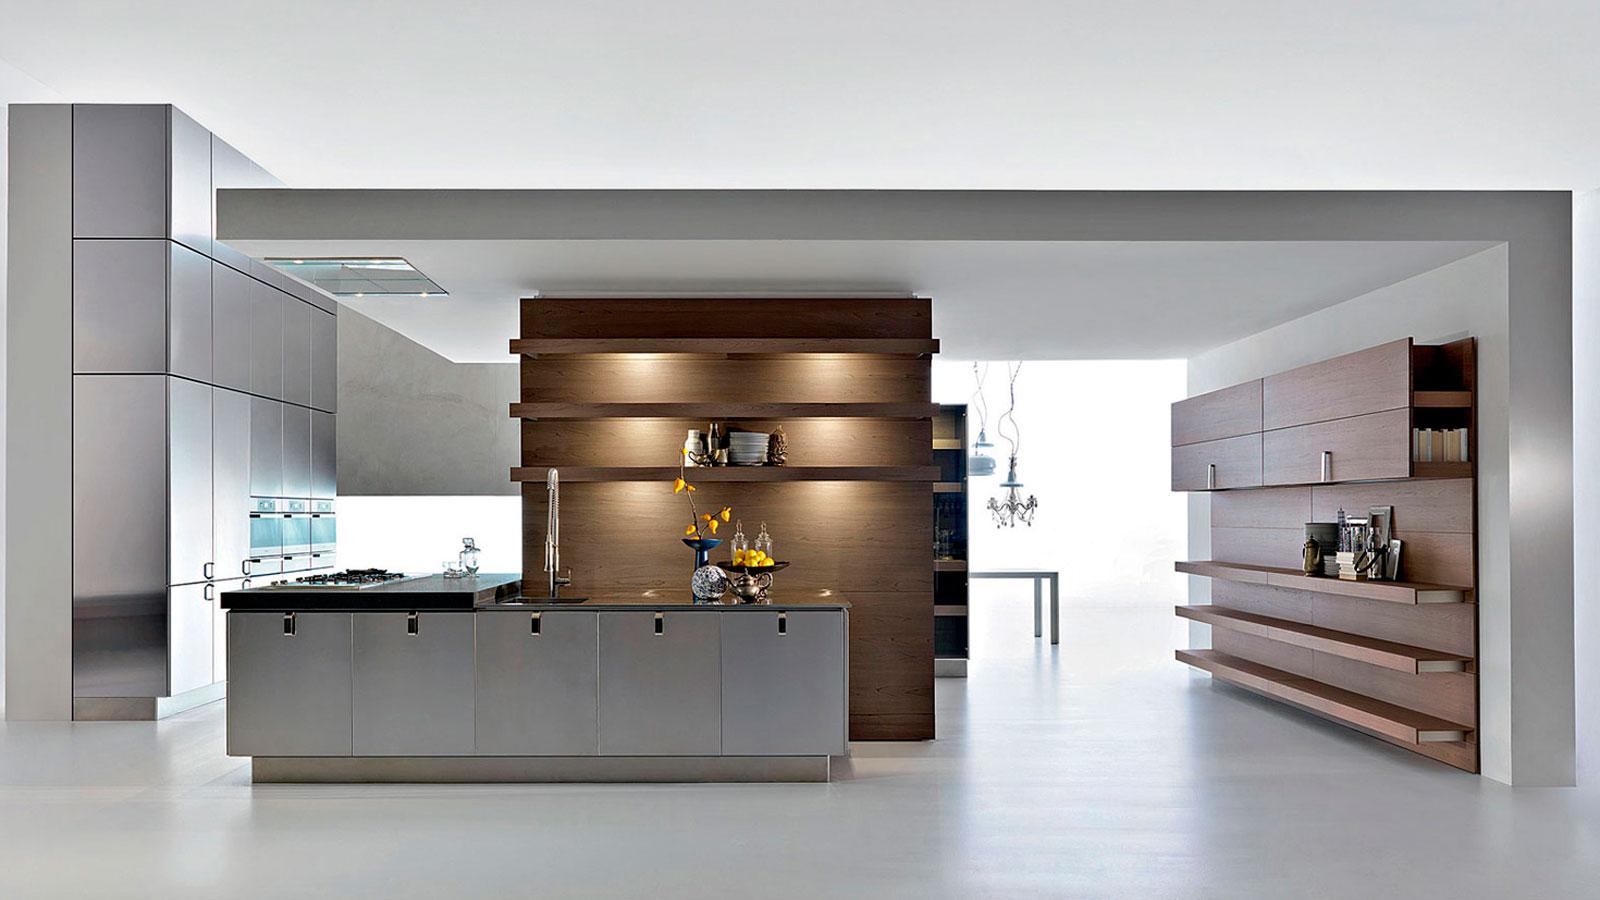 Emejing Dada Cucine Prezzi Ideas - Amazing House Design ...